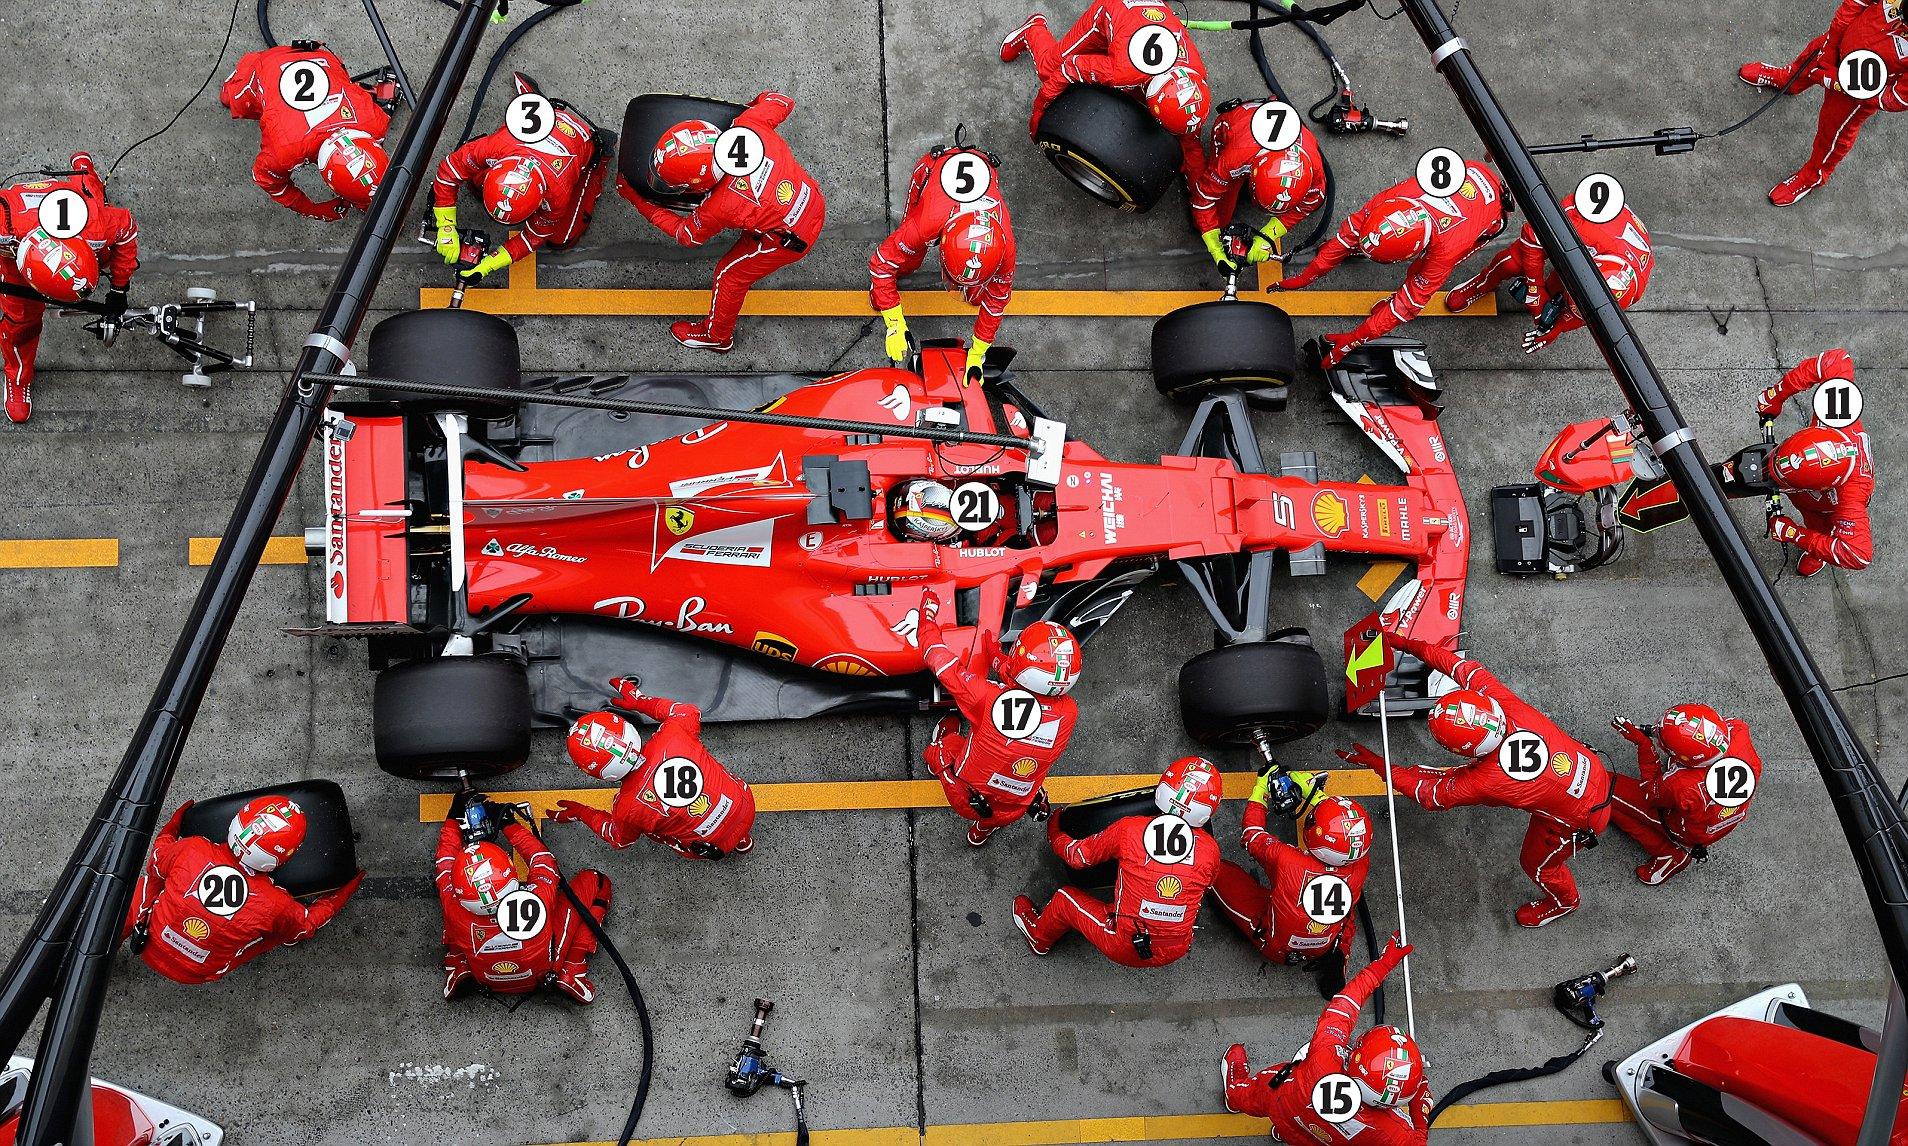 F1 Grand Prix of China